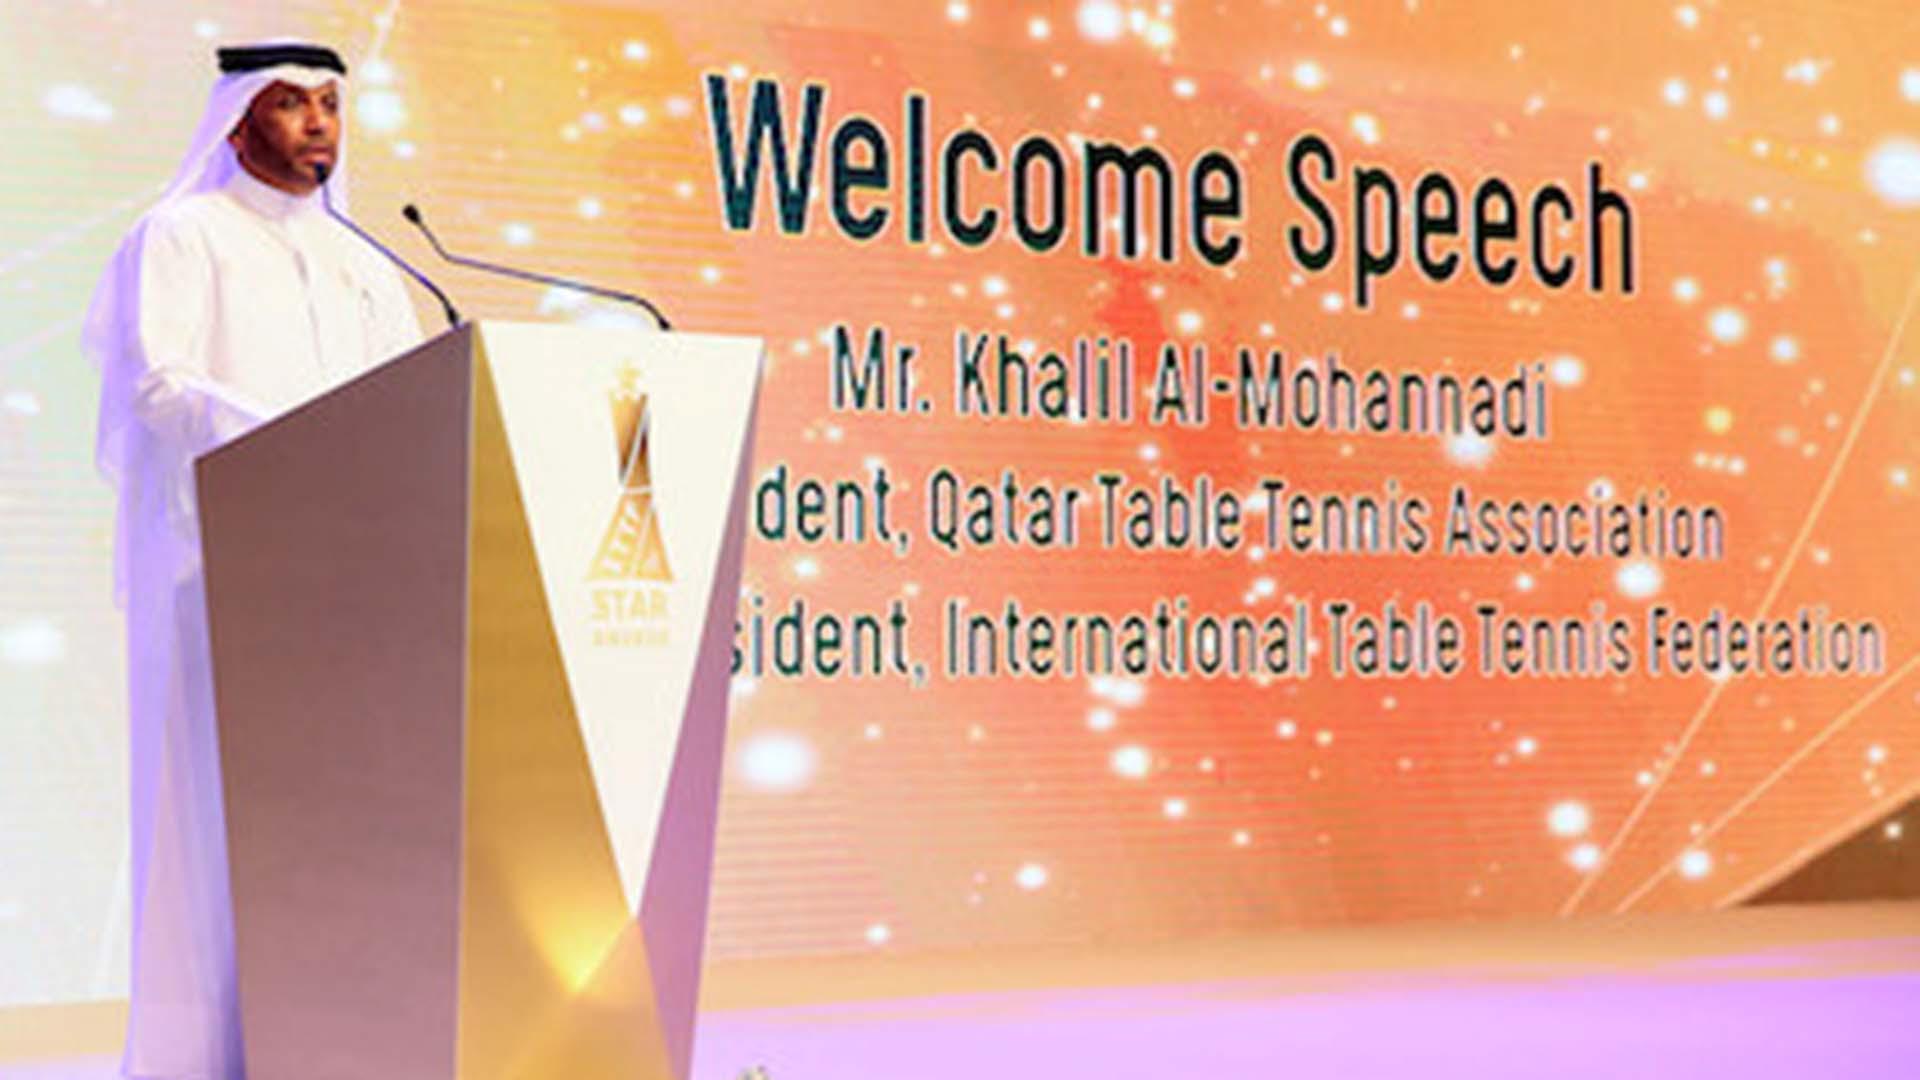 Khalil Al-Mohannadi announces candidacy for ITTF President